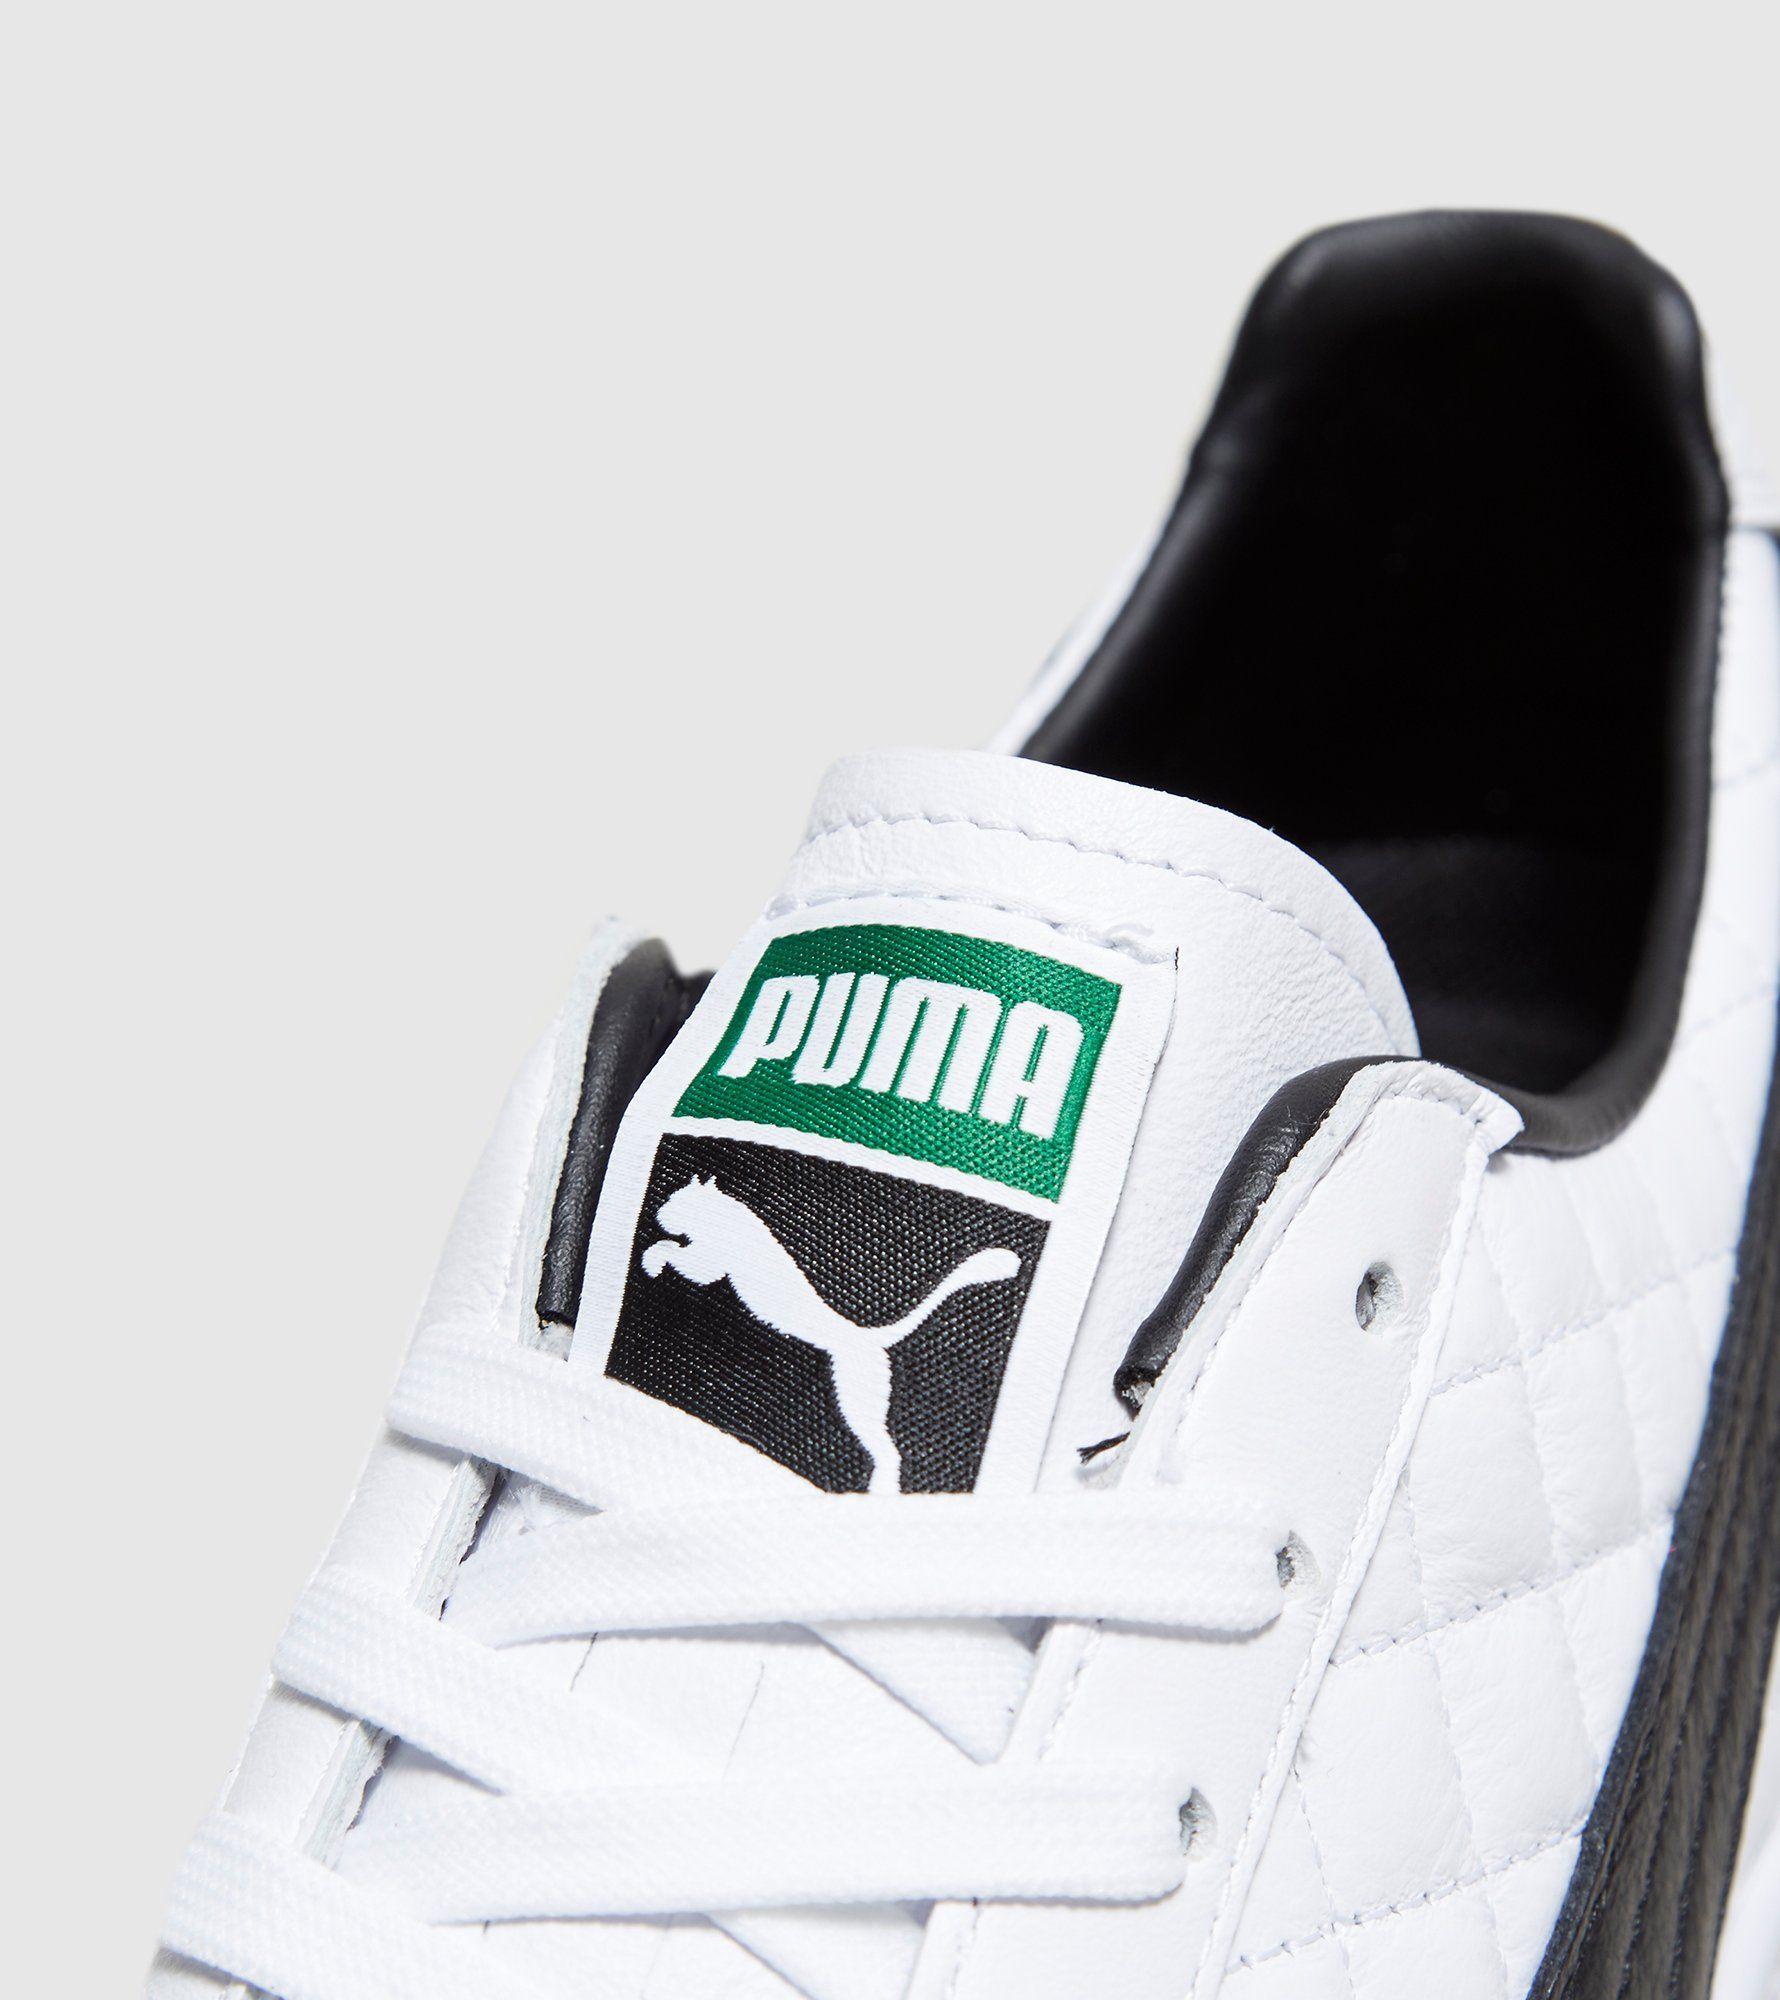 PUMA Clyde 'Dressed Pack'